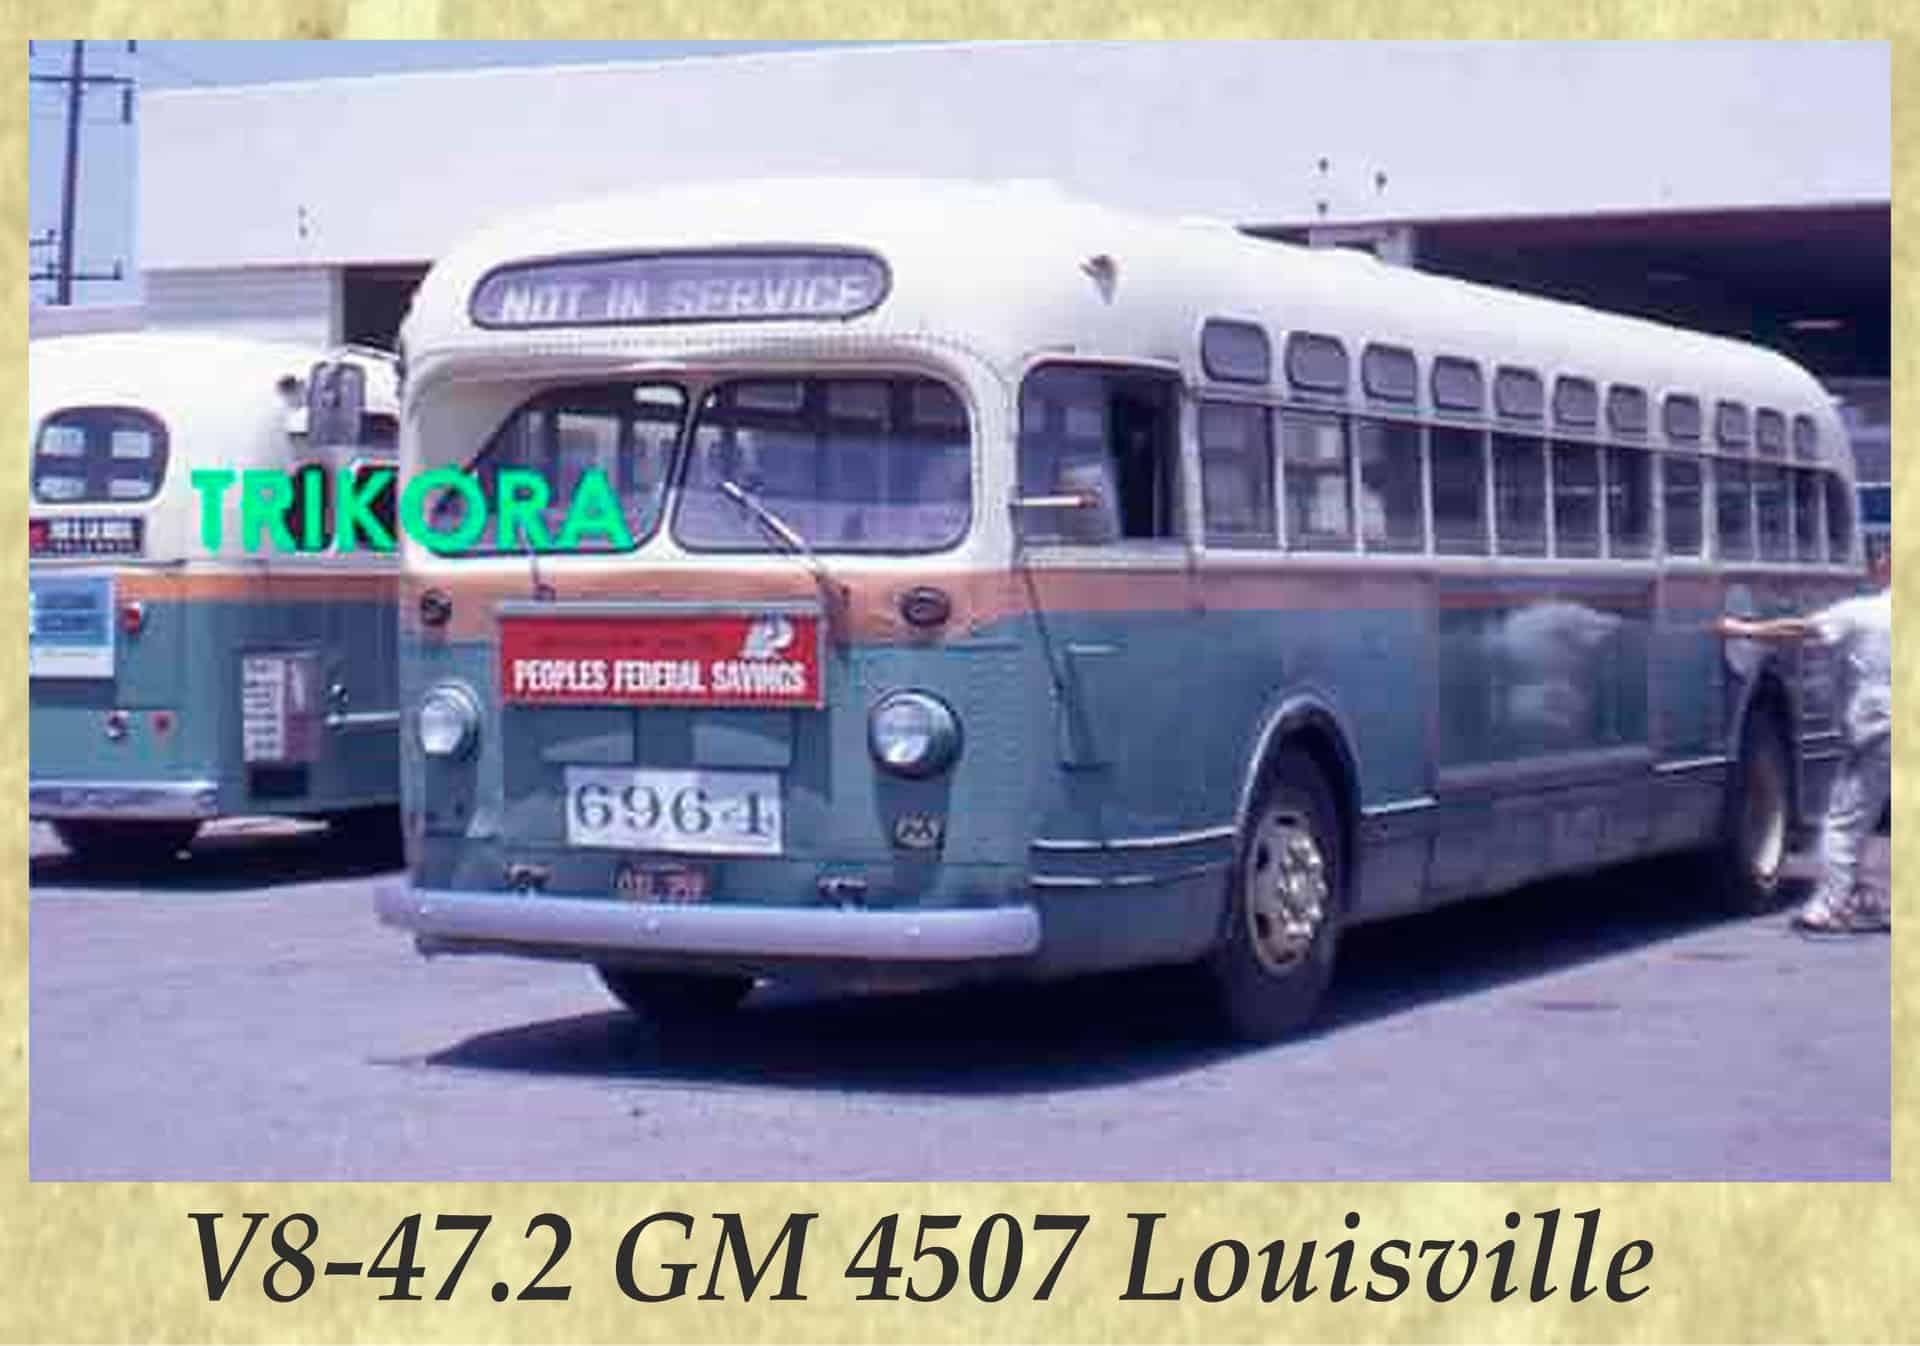 V8-47.2 GM 4507 Louisville